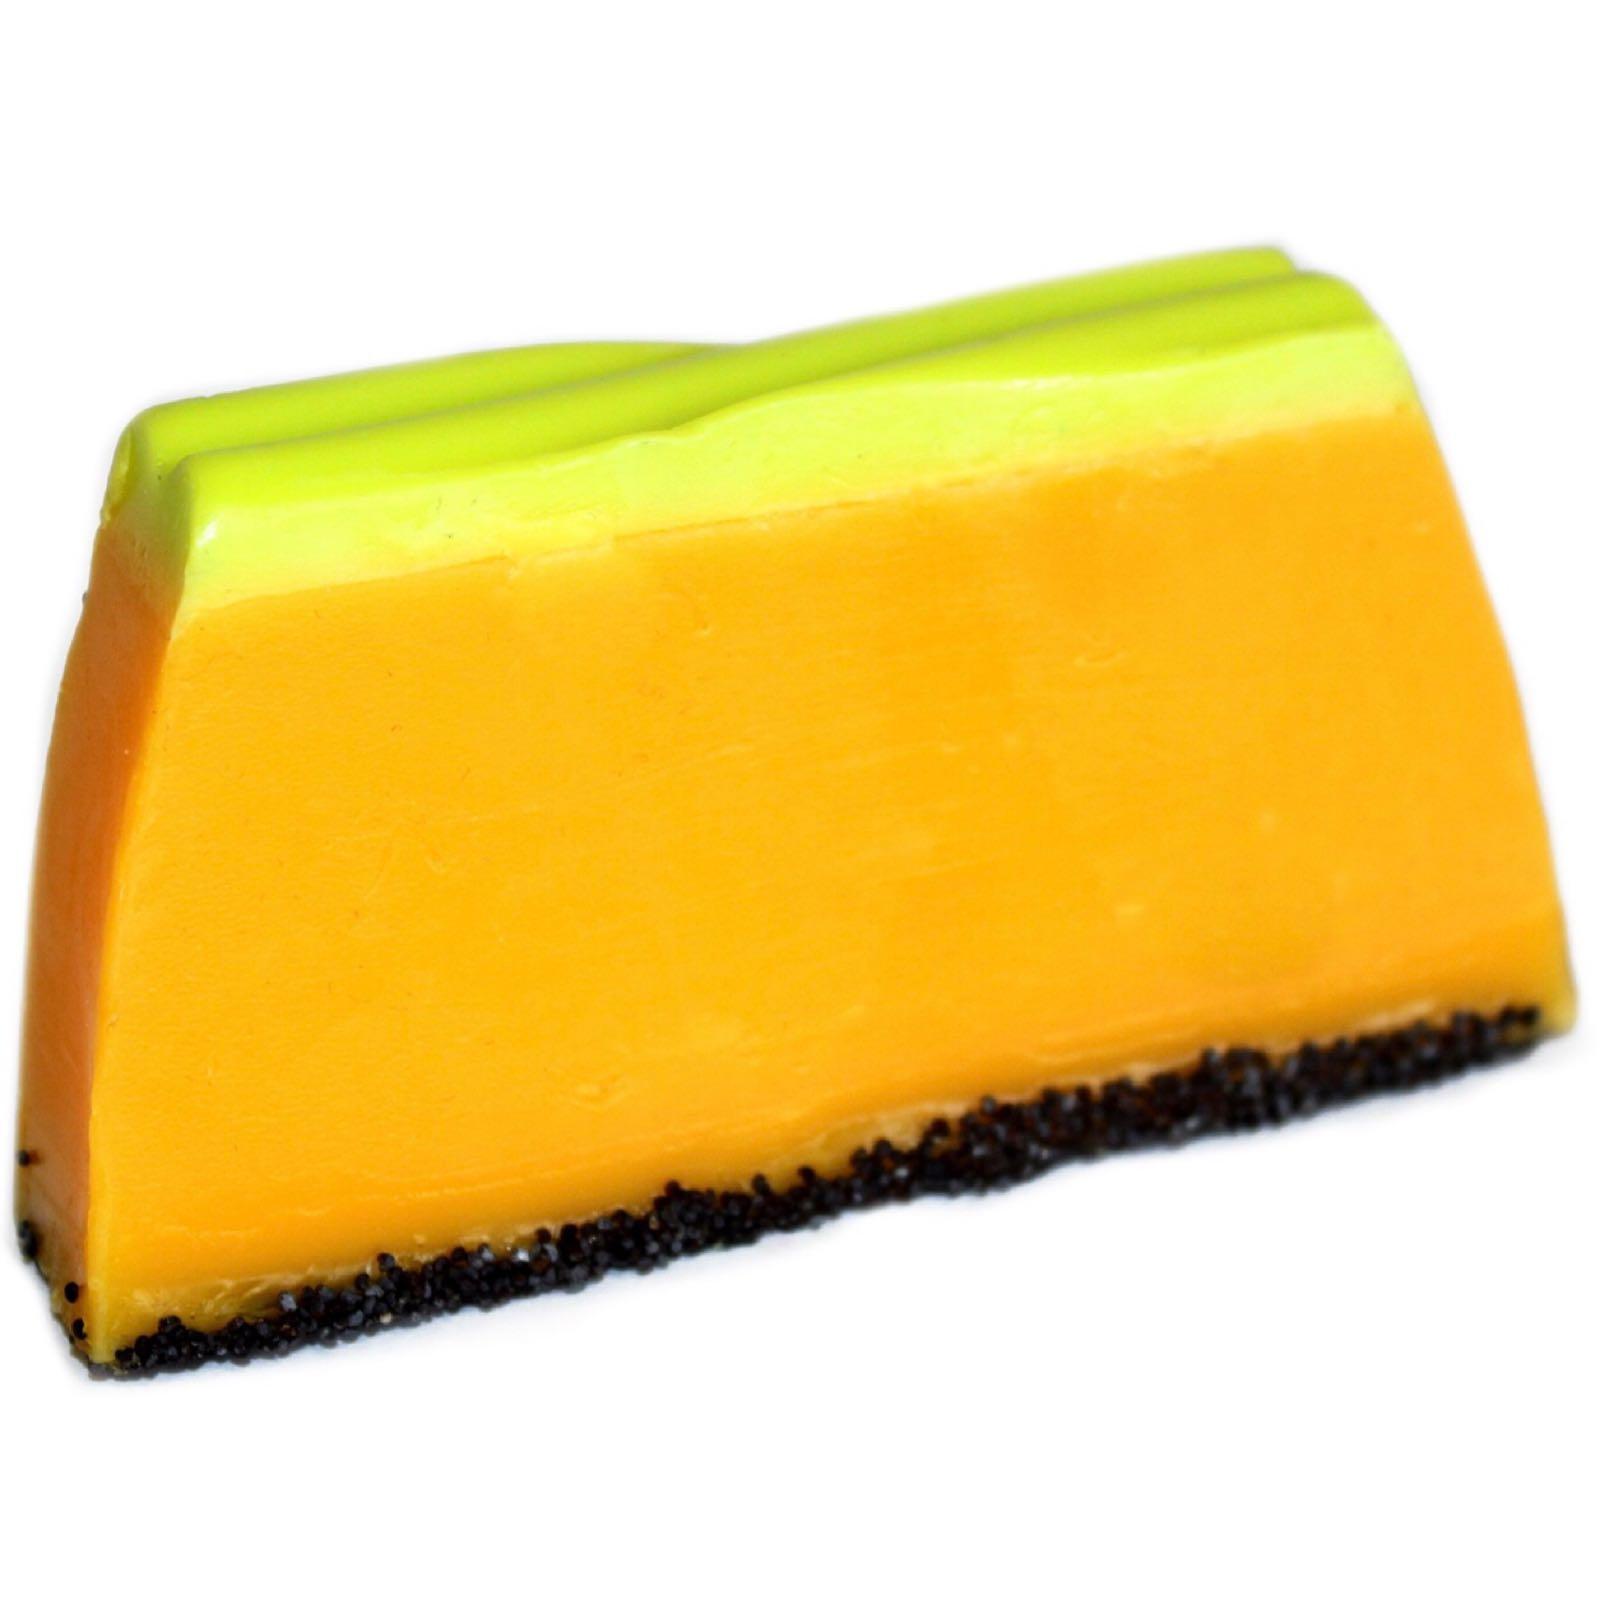 Papaya Soap Slice